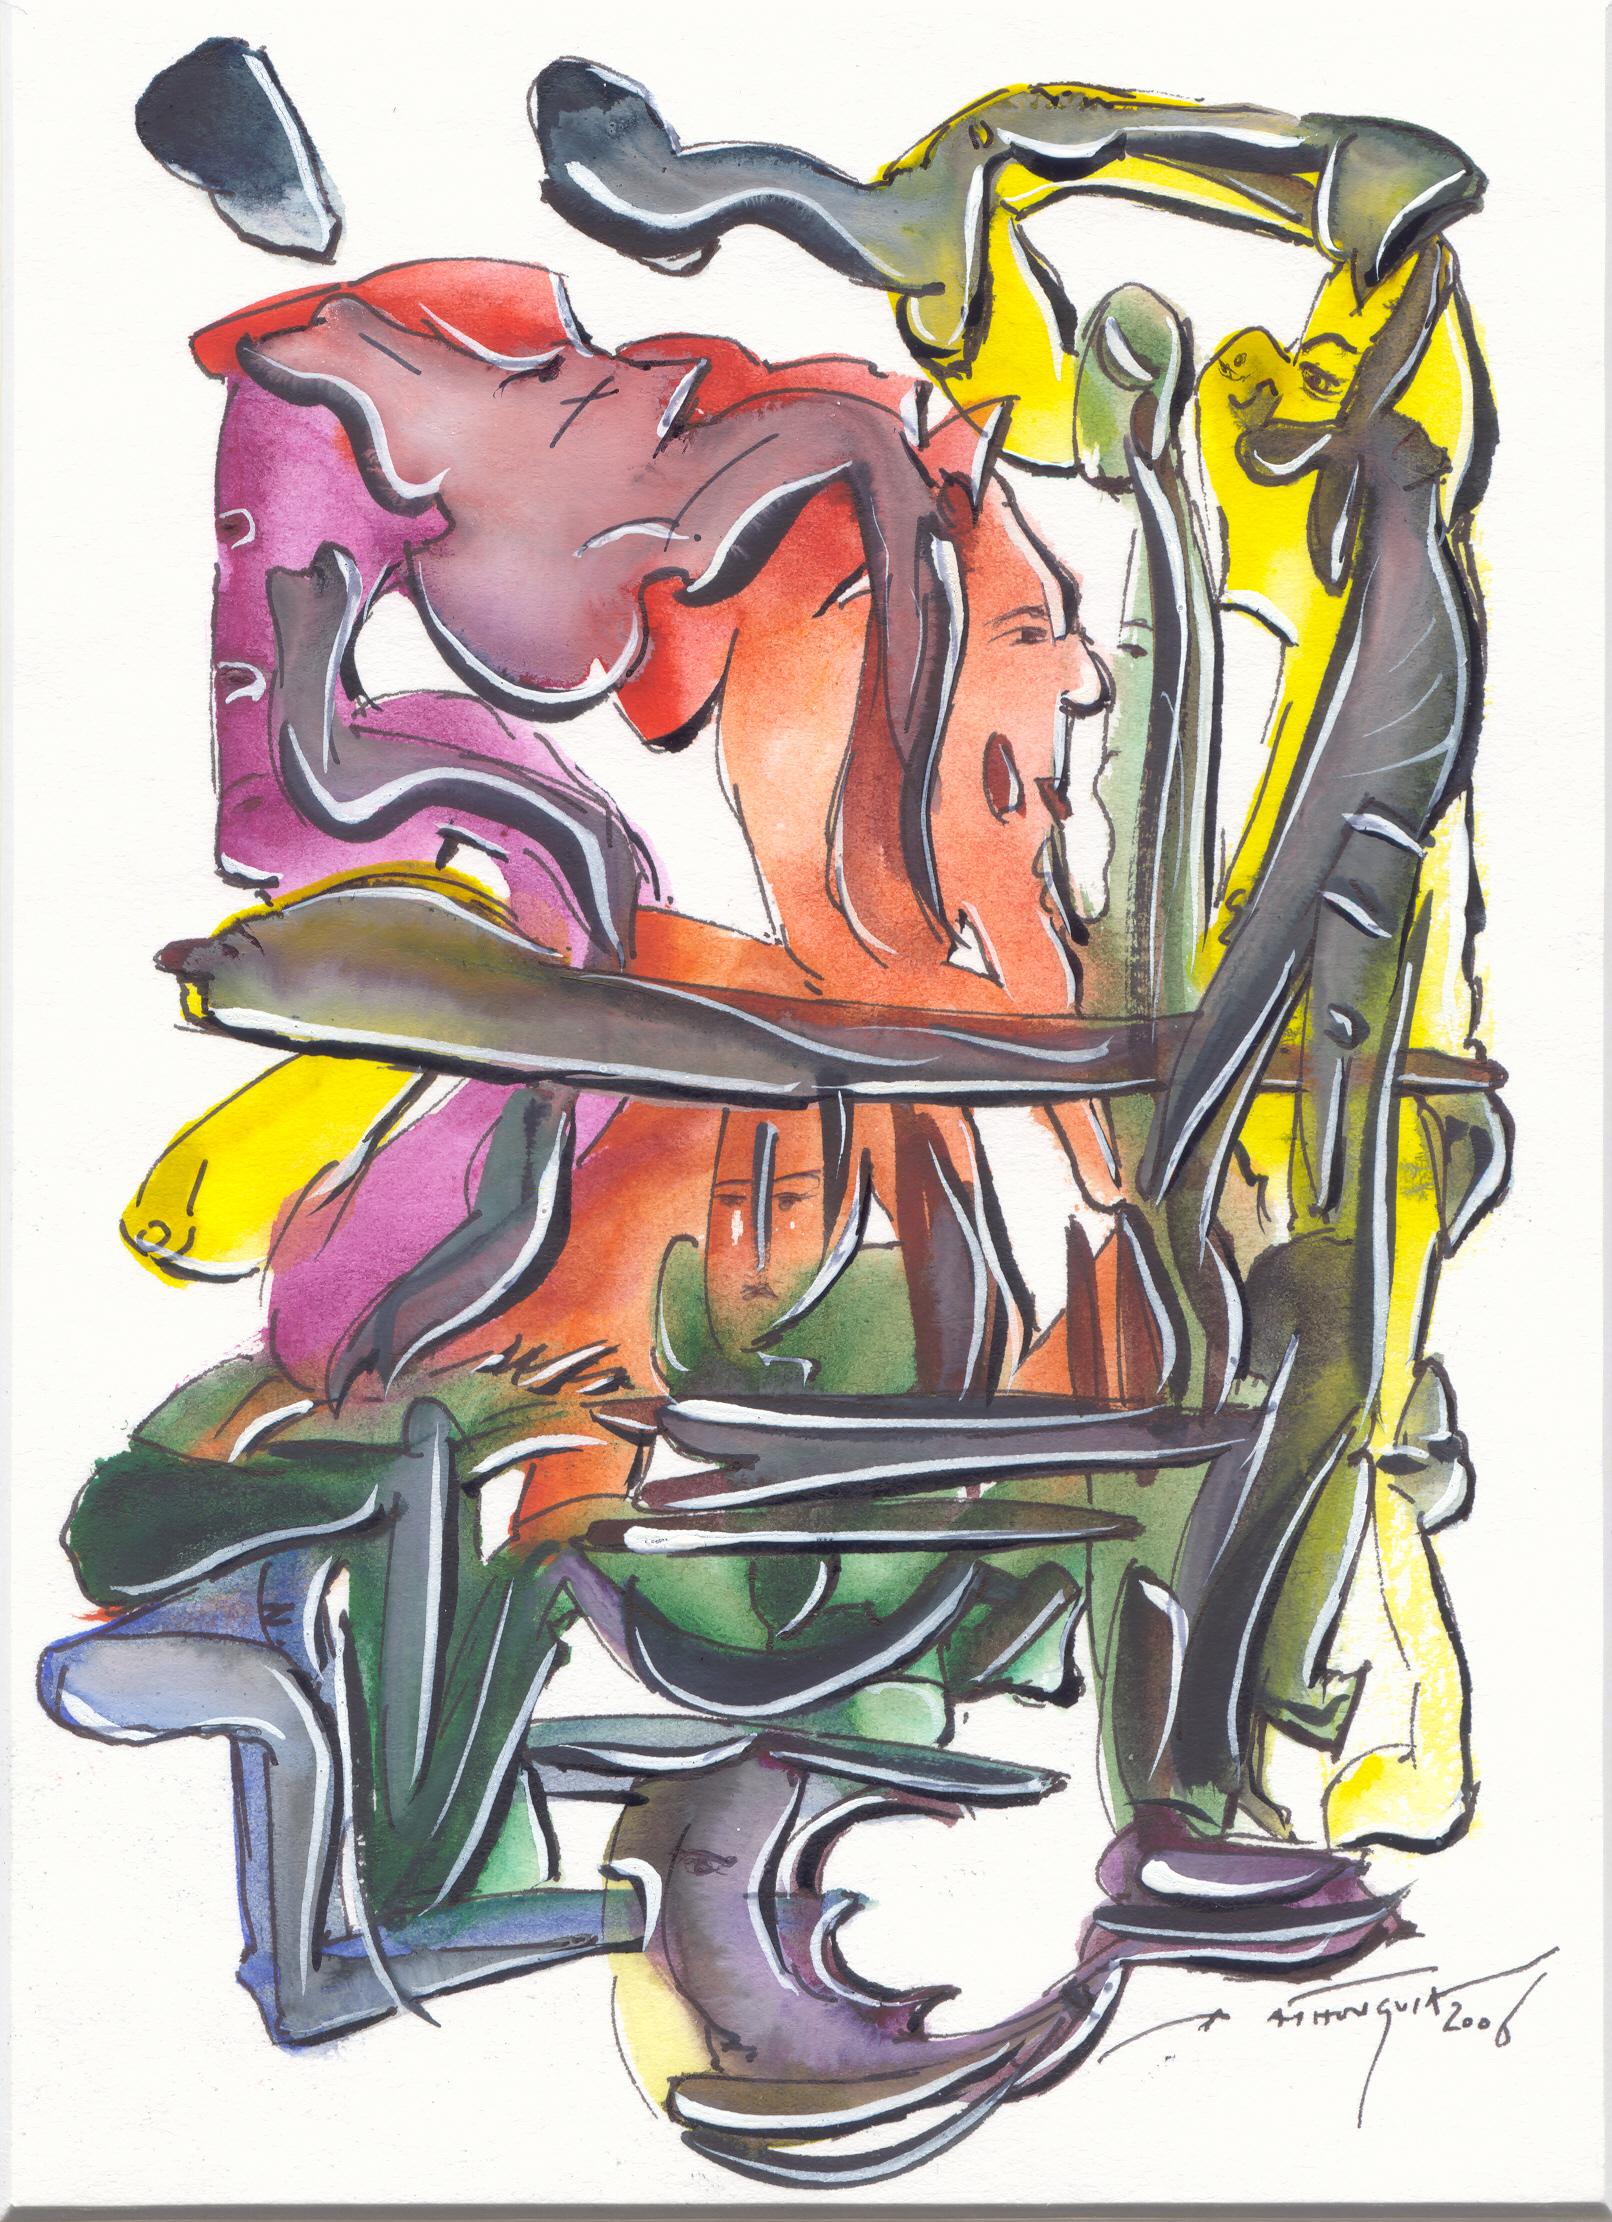 06 Imatteeett 13,3x18,8 2006.jpg